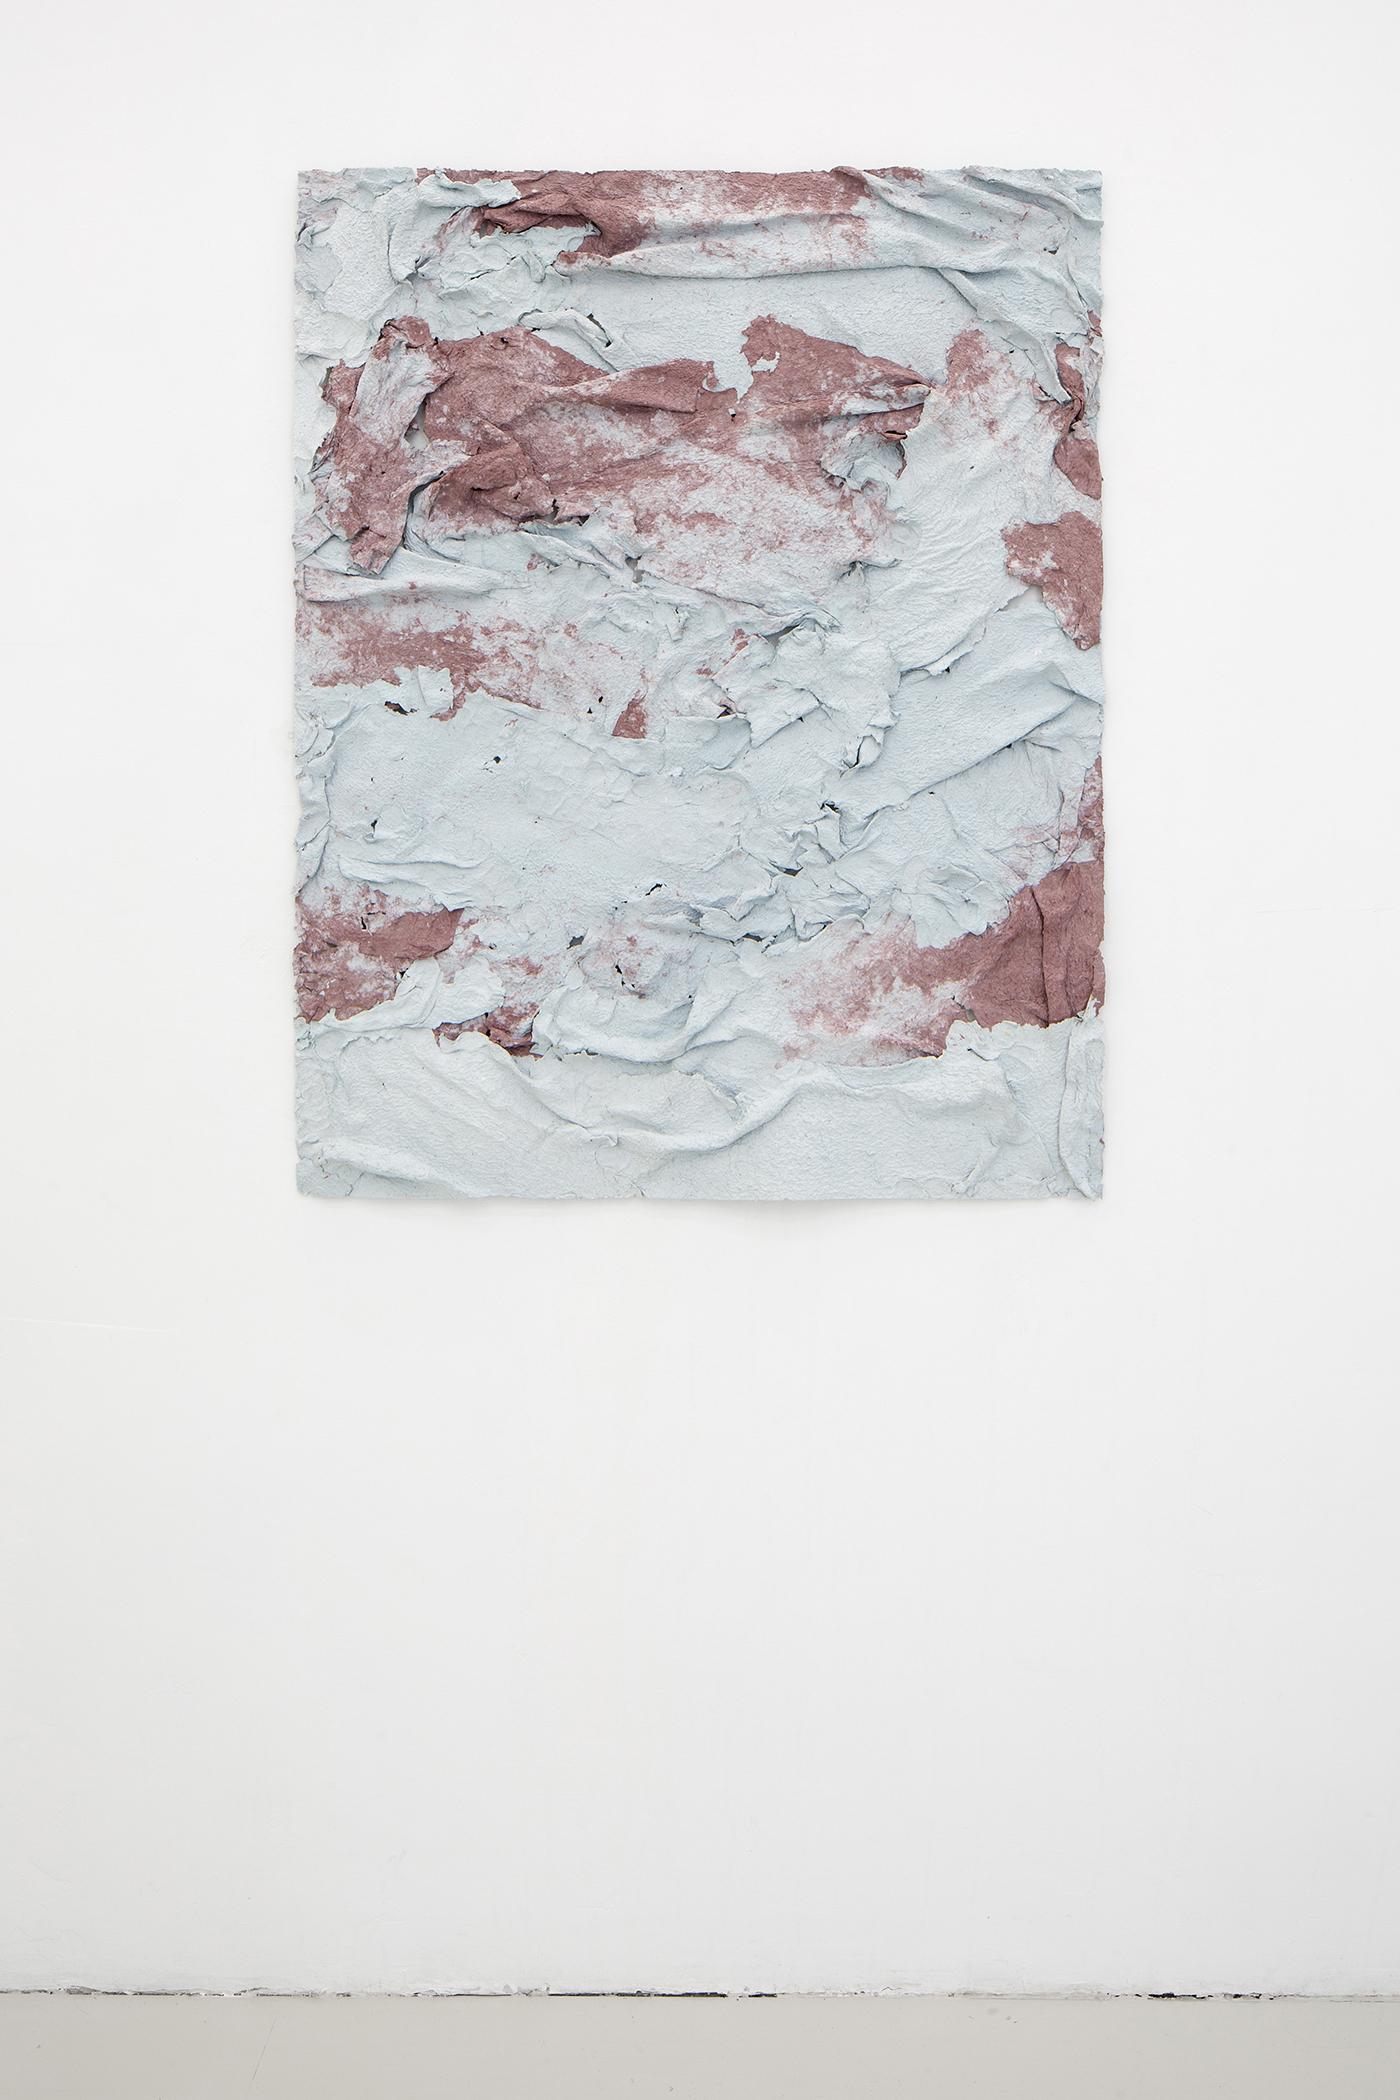 Fanny Hellgren, Dissolved, 2019 (Paper pulp and pigment, 94 x 73 cm)